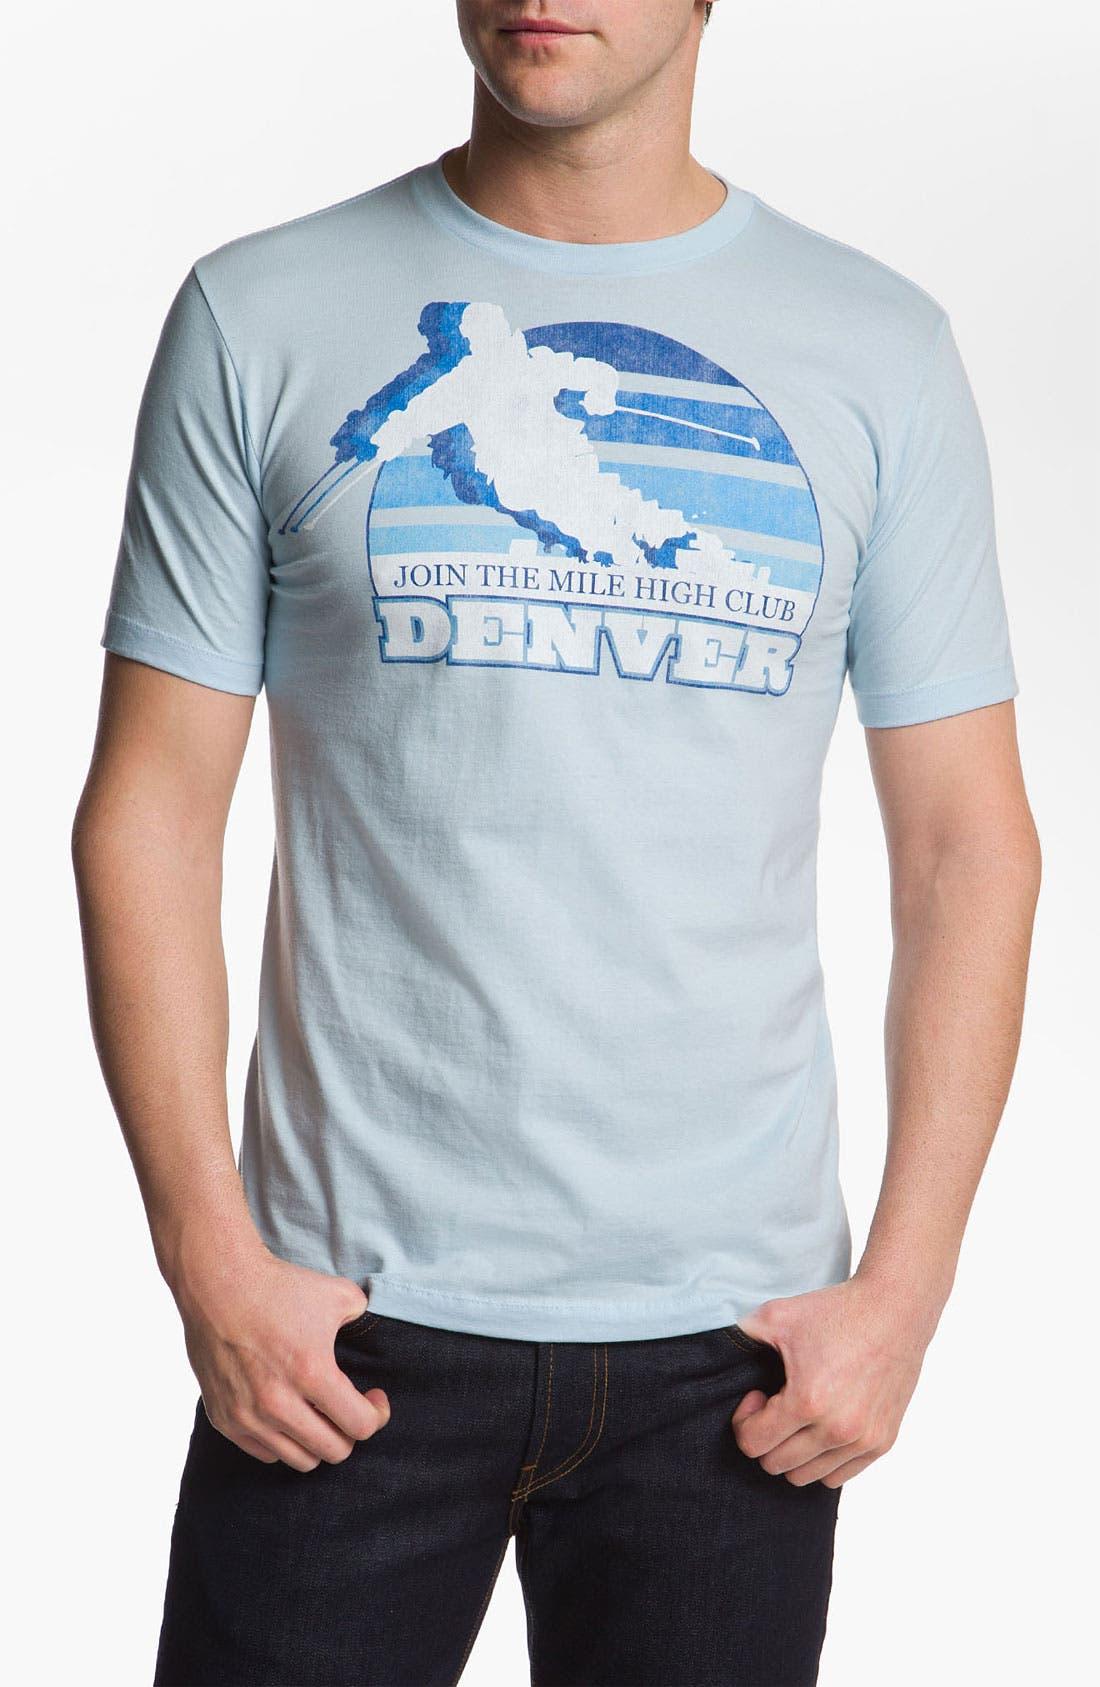 Alternate Image 1 Selected - Topless 'Mile High Denver' T-Shirt